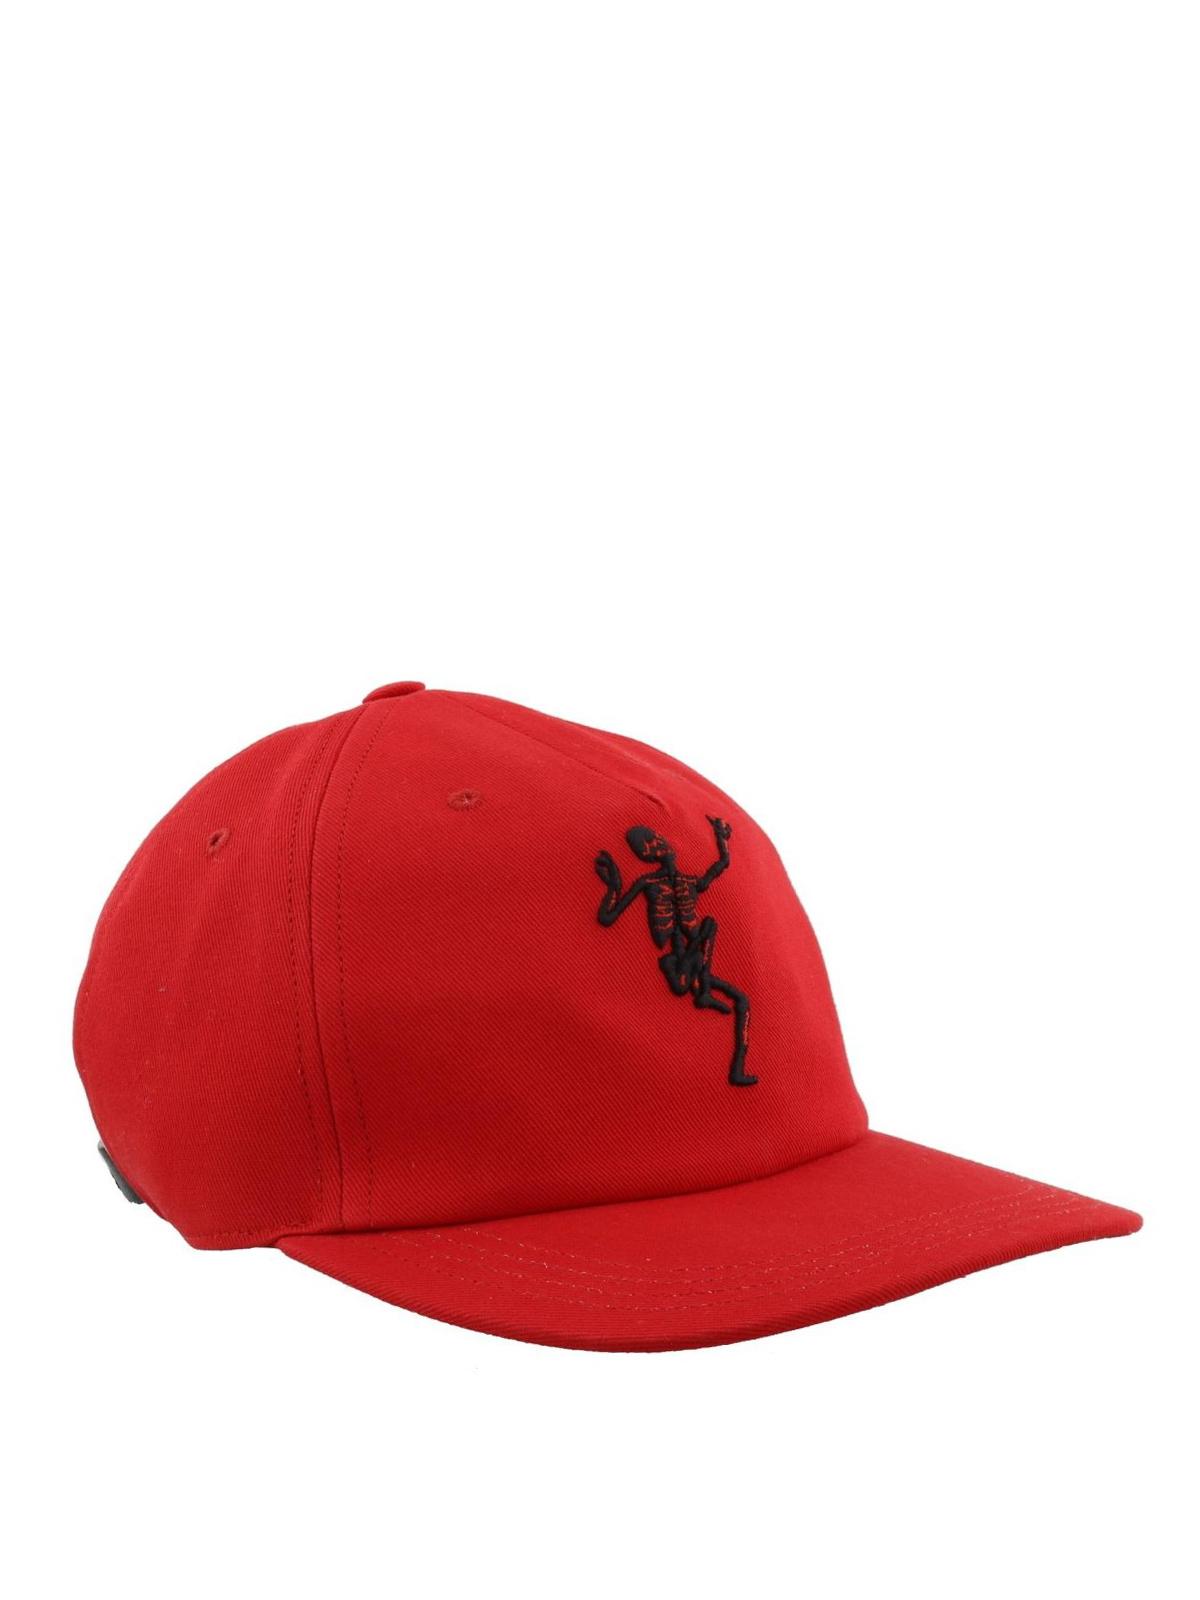 Alexander Mcqueen - Dancing Skeleton baseball cap - hats   caps ... ae9c3223b2e9